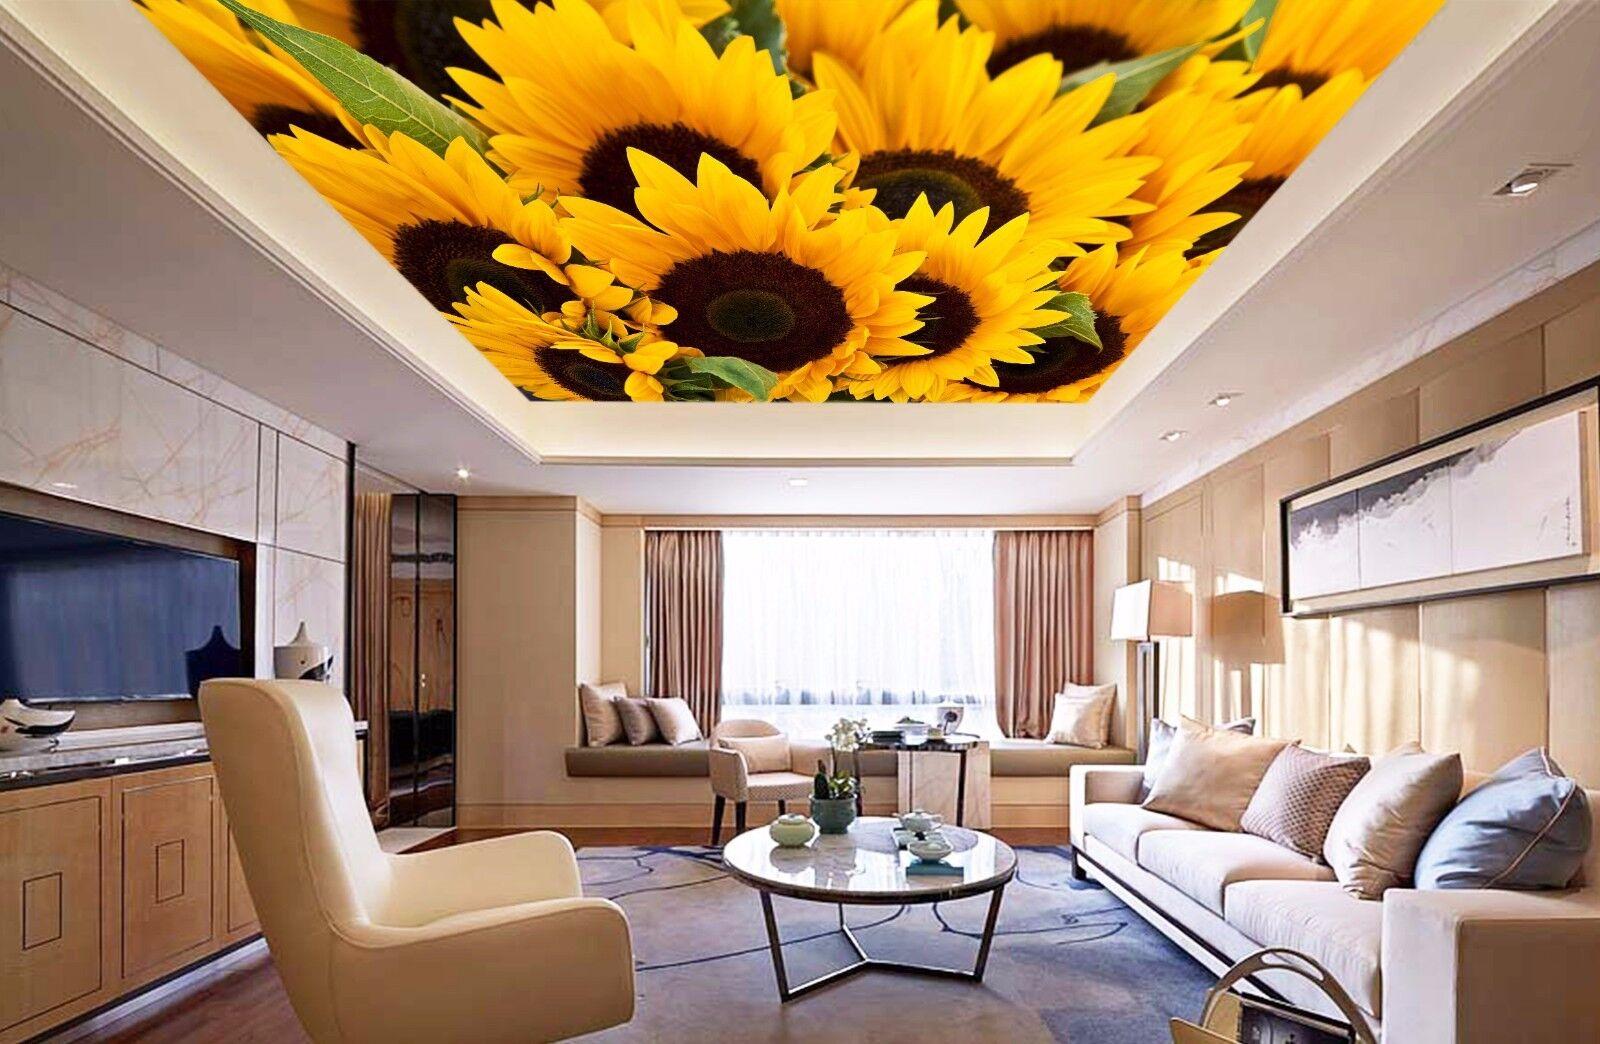 3D Sunflower 743 Ceiling WallPaper Murals Wall Print Decal Deco AJ WALLPAPER GB